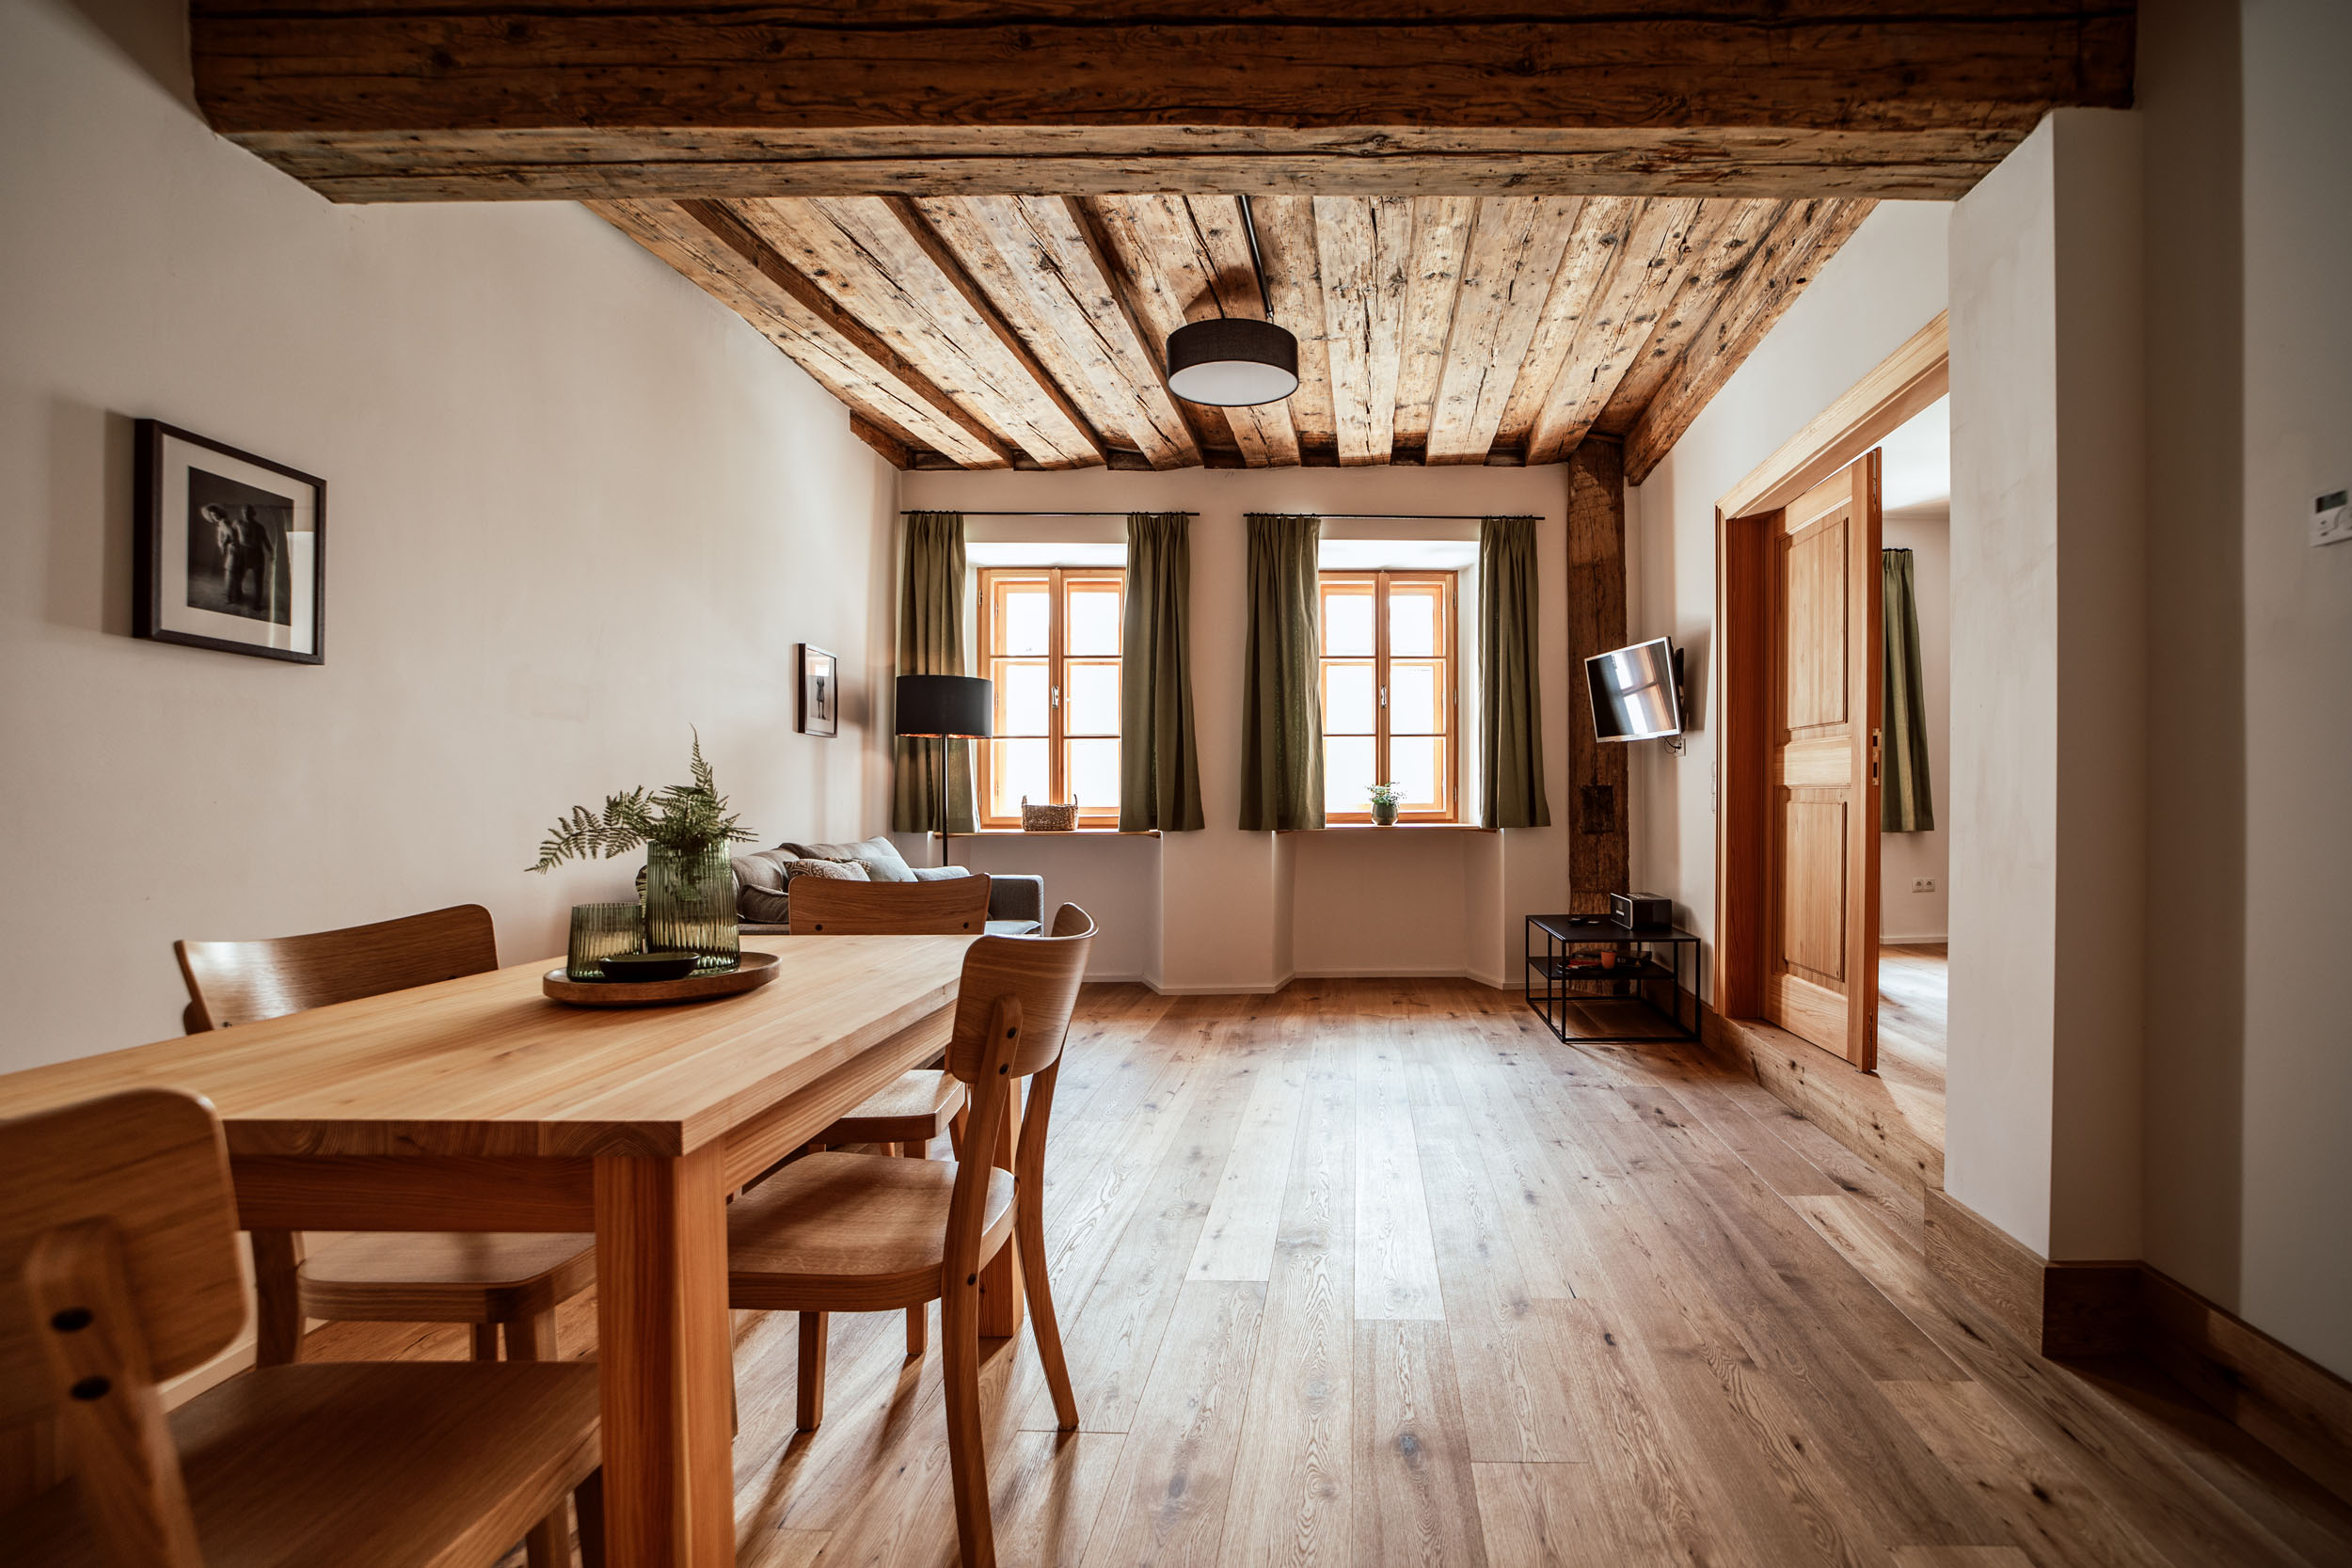 106 Wohn Holzdecke 2